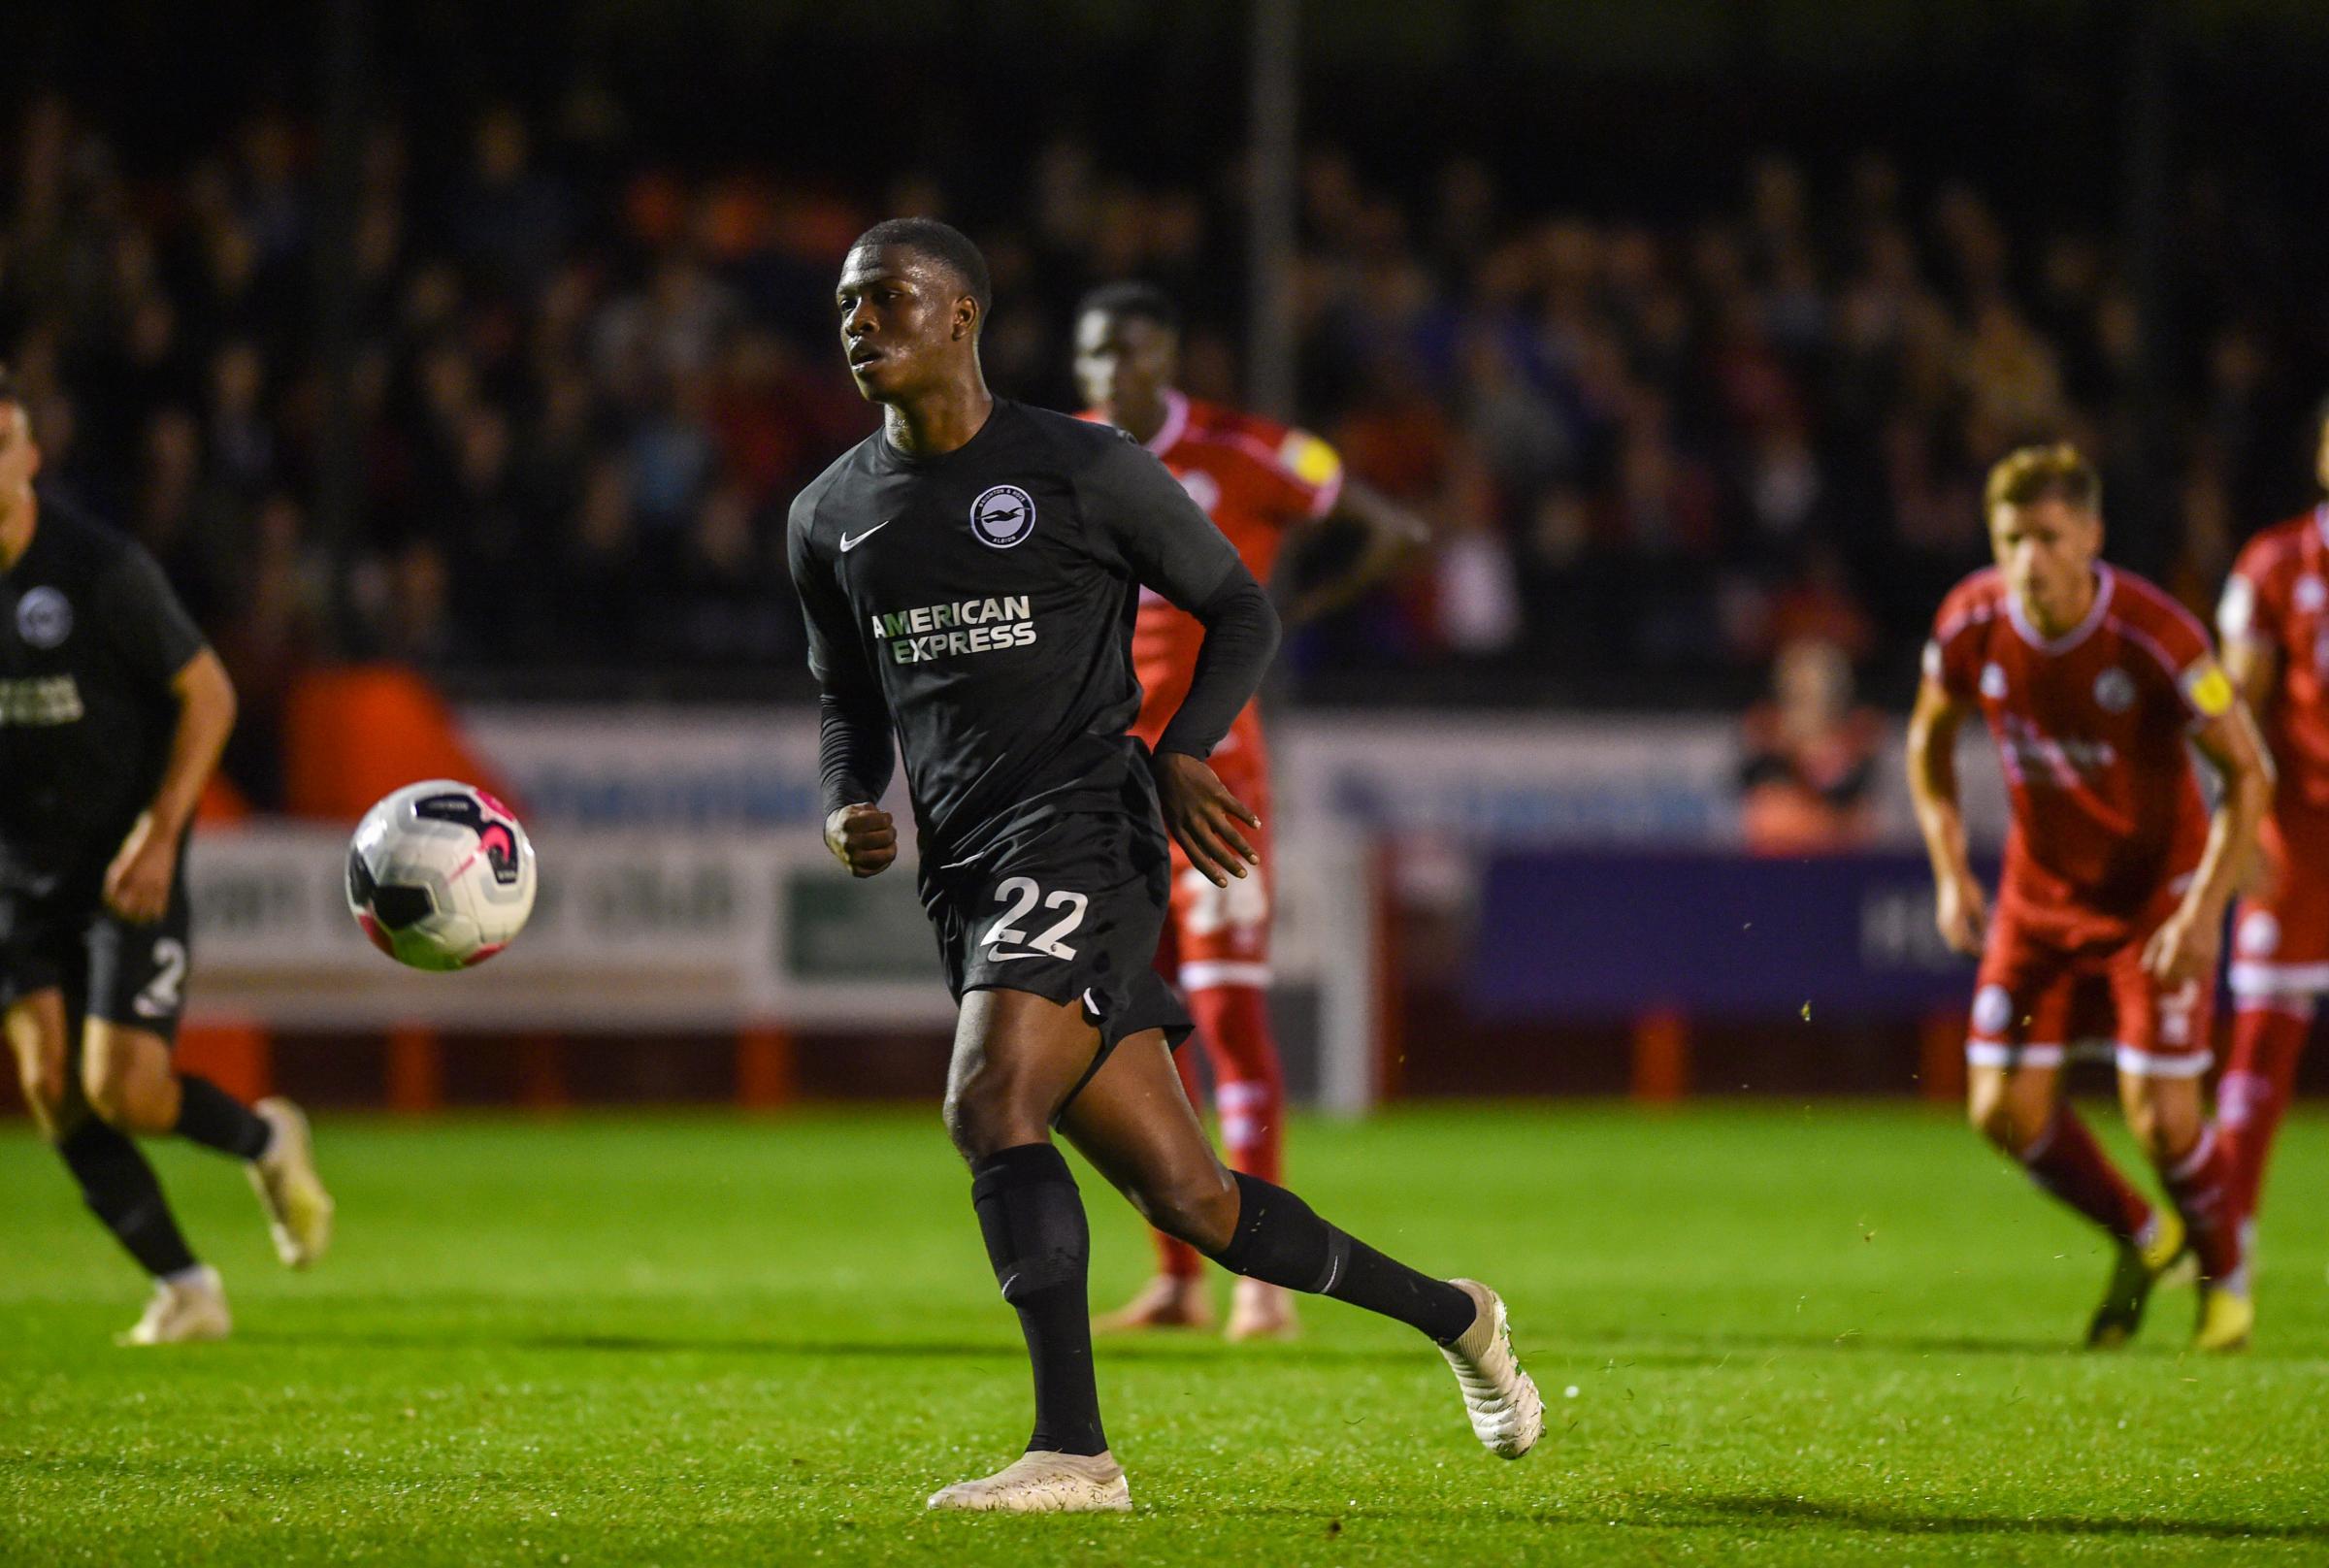 Crawley 0, Albion 1: Richards scores late winner